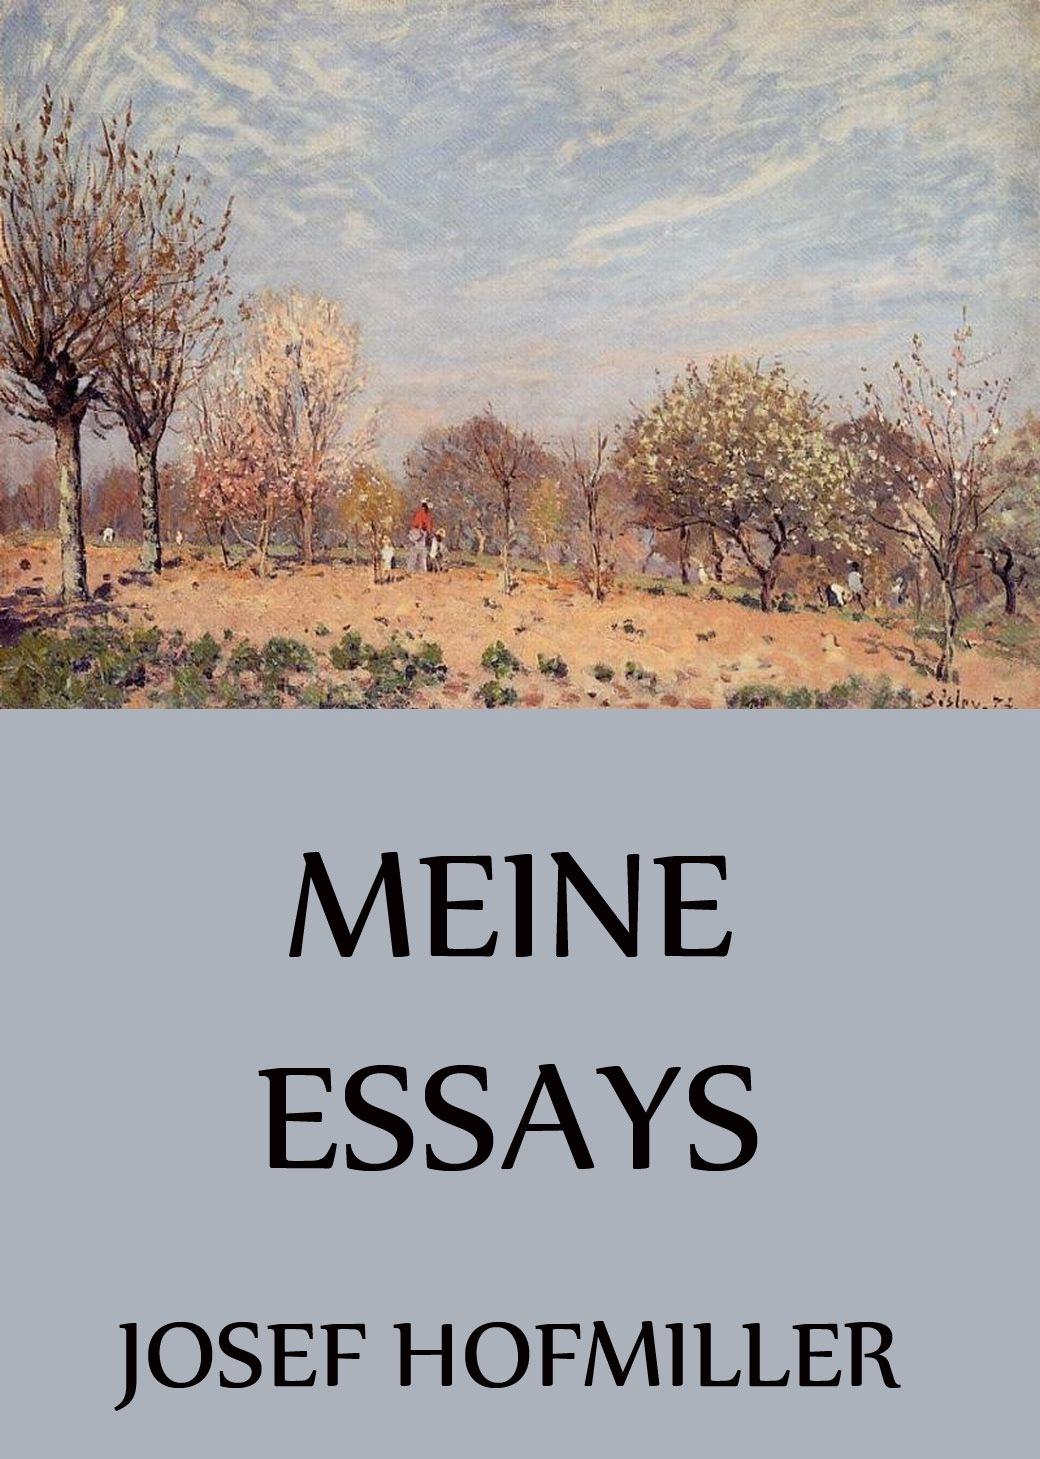 Josef Hofmiller Meine Essays